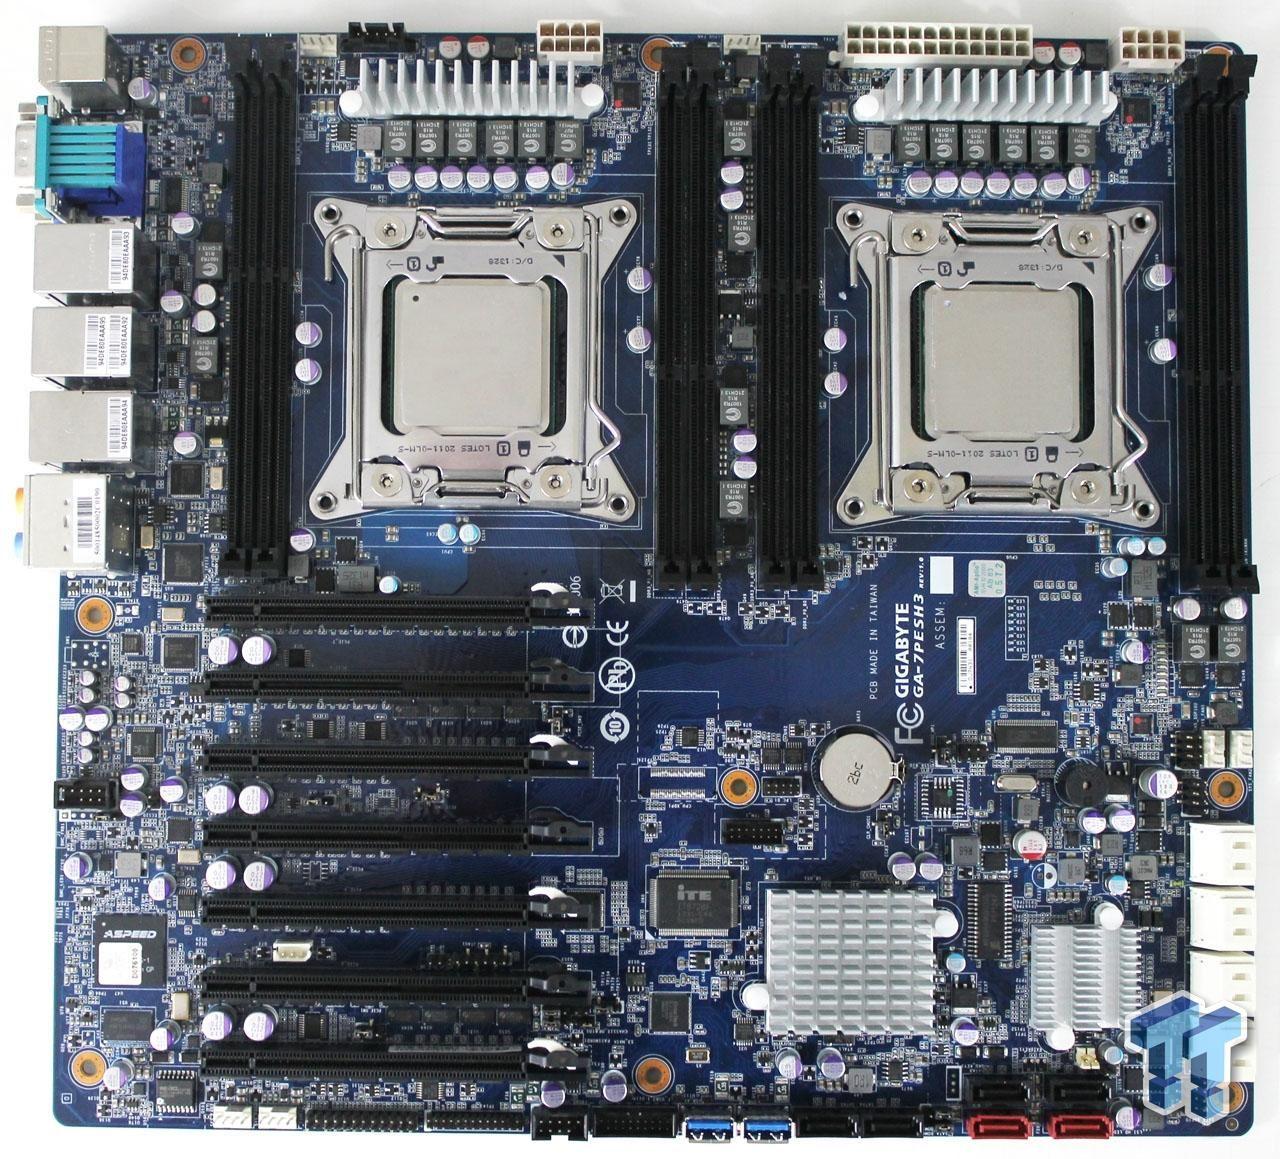 GIGABYTE GA-7PESH3 (Intel C602) Workstation Motherboard Review